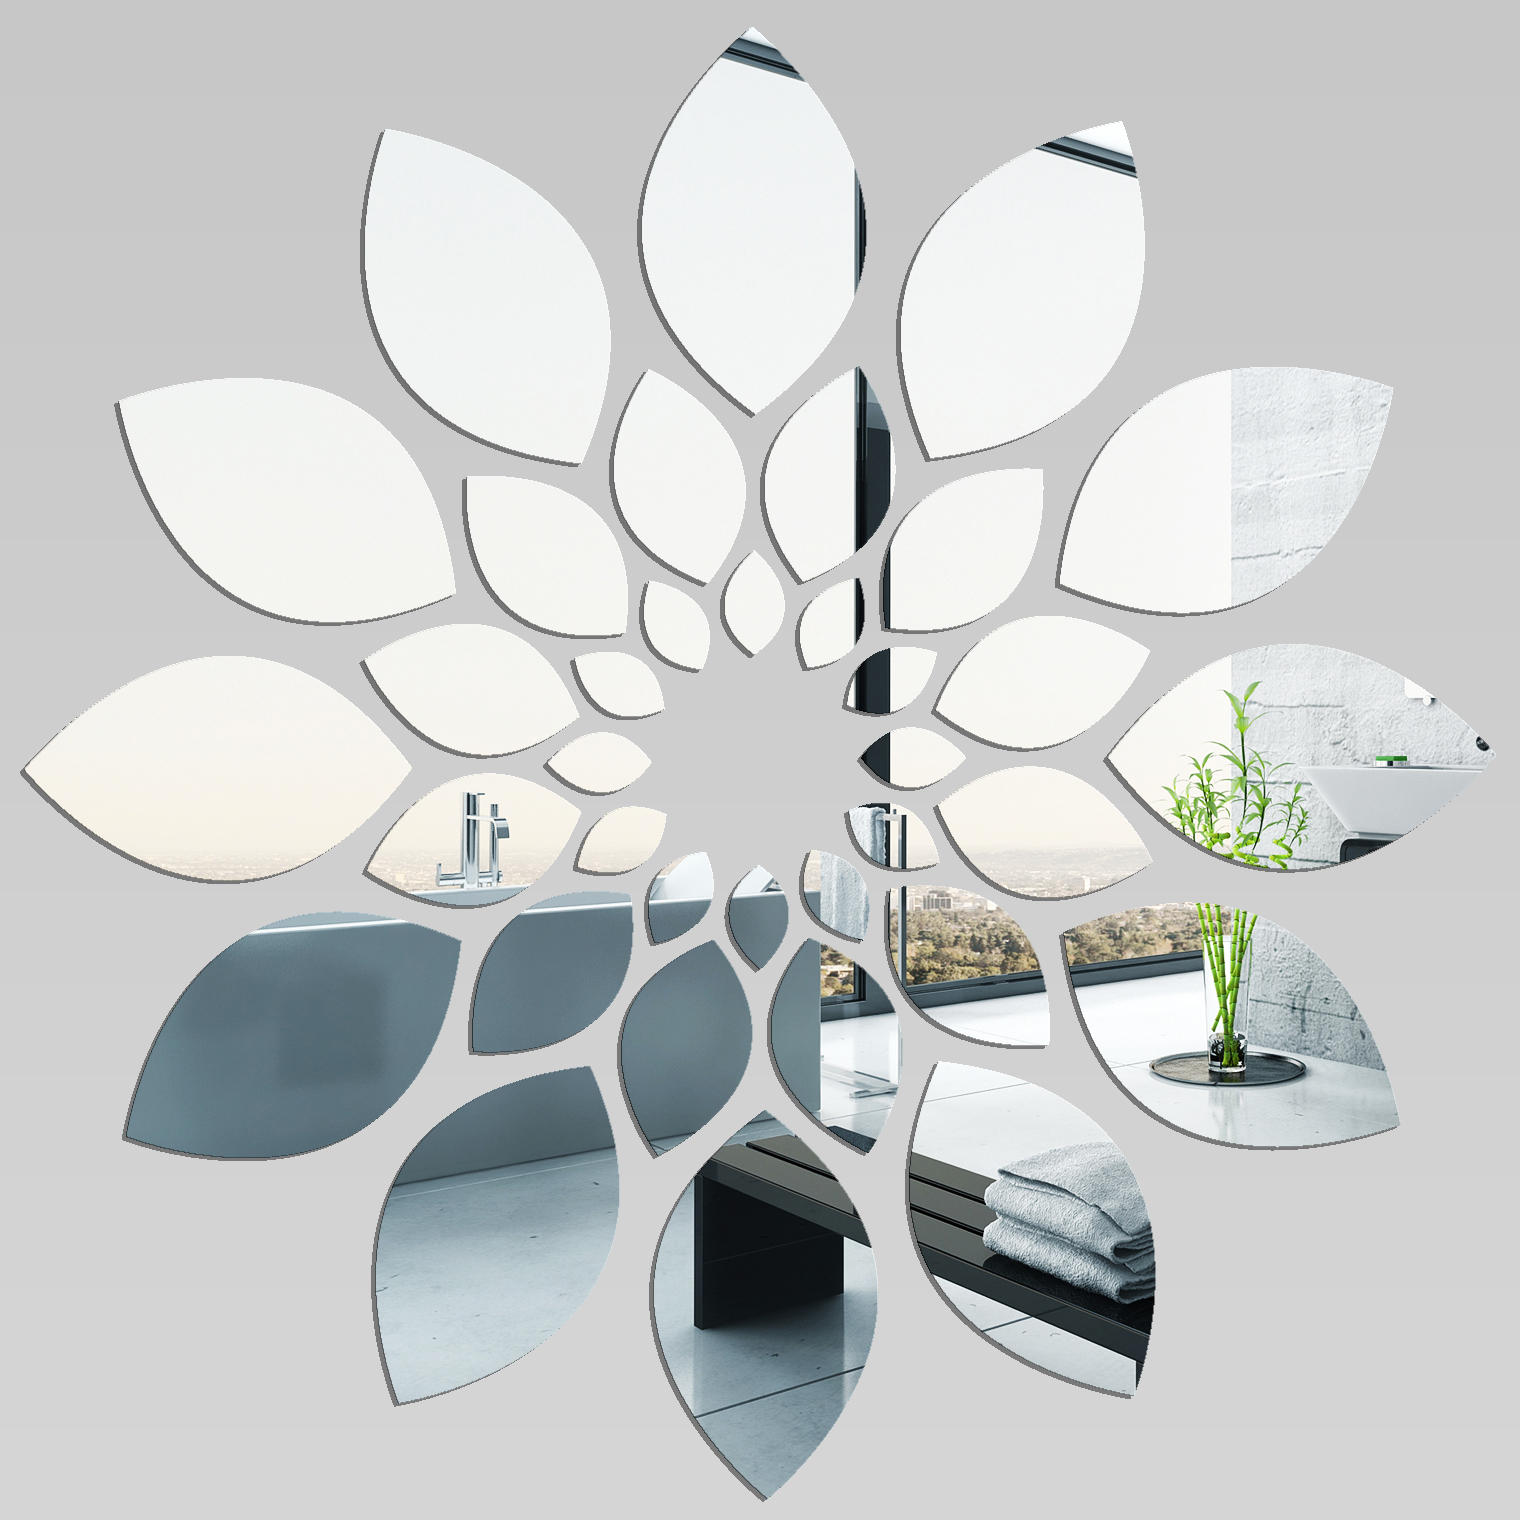 Vinilos folies espejos decorativo acr lico pl xiglas flor for Modelos de espejos decorativos